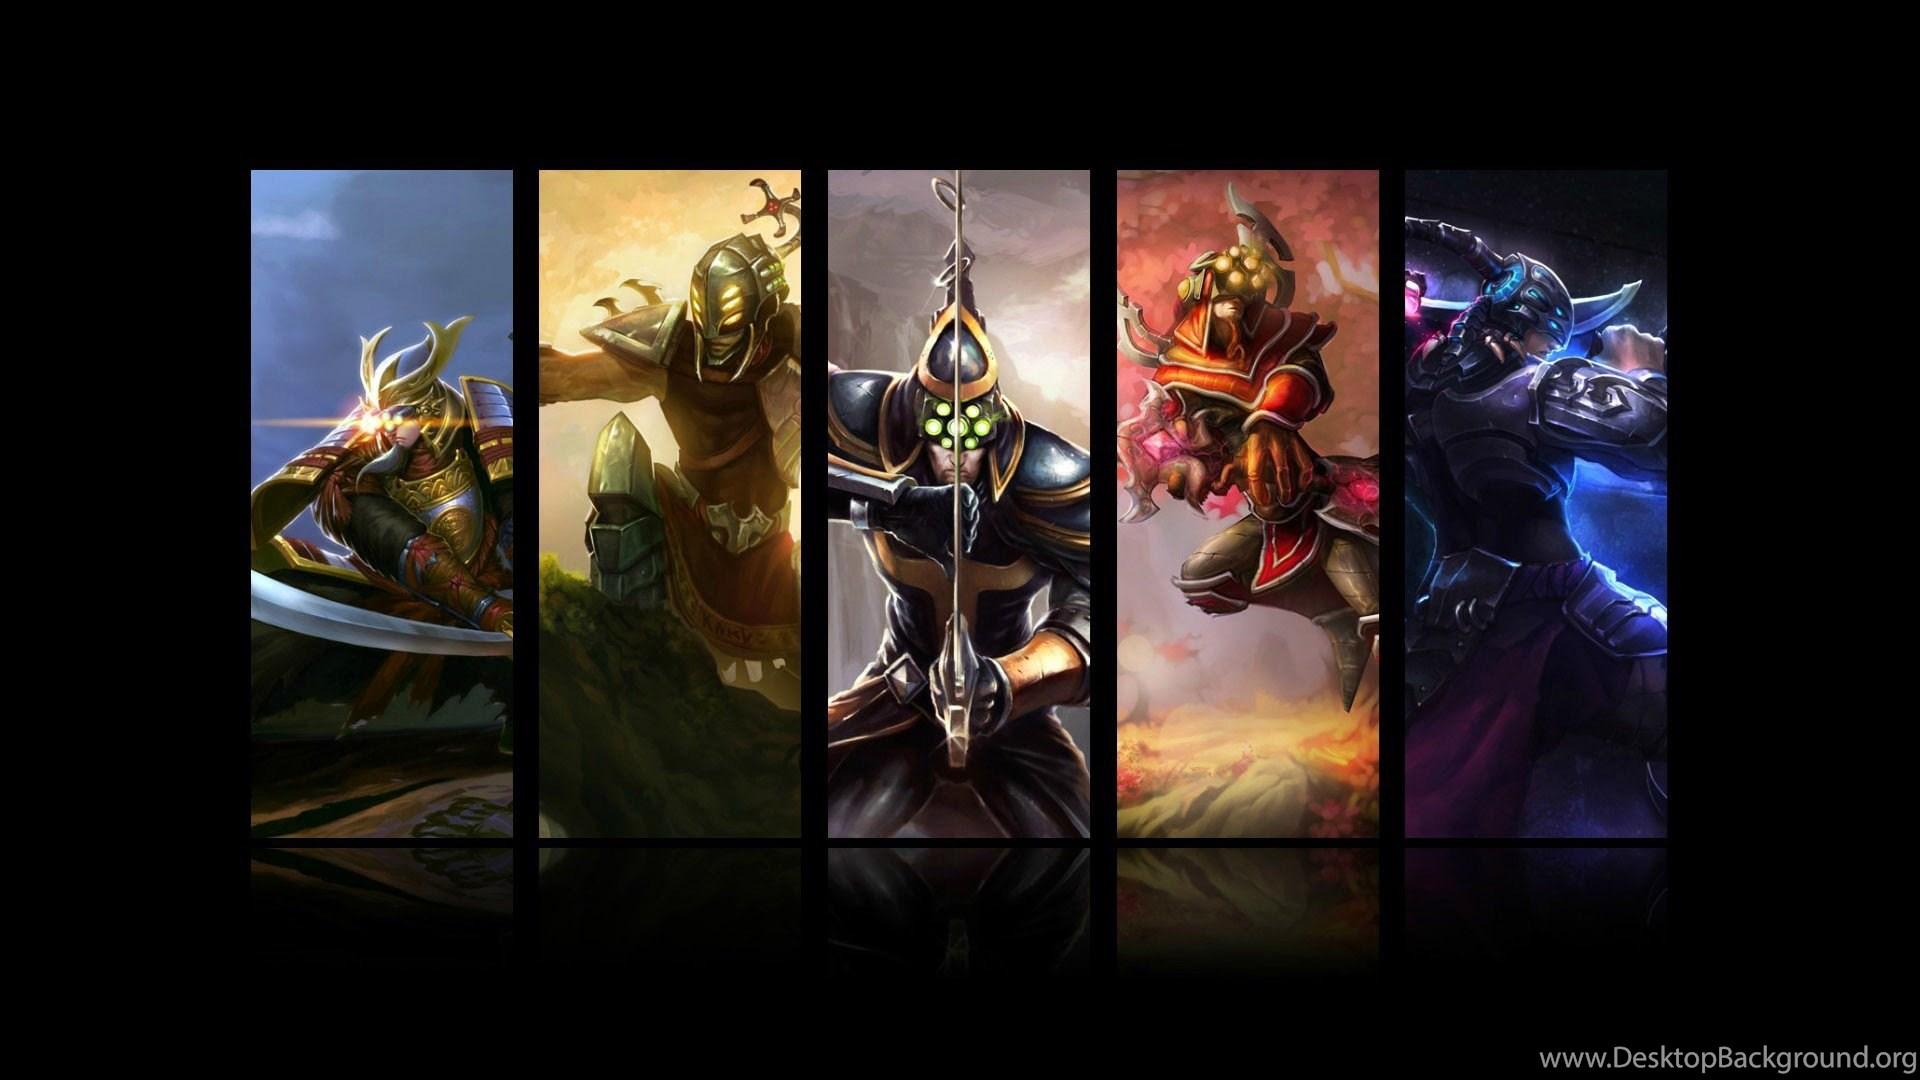 27 Master Yi League Of Legends Hd Wallpapers Desktop Background